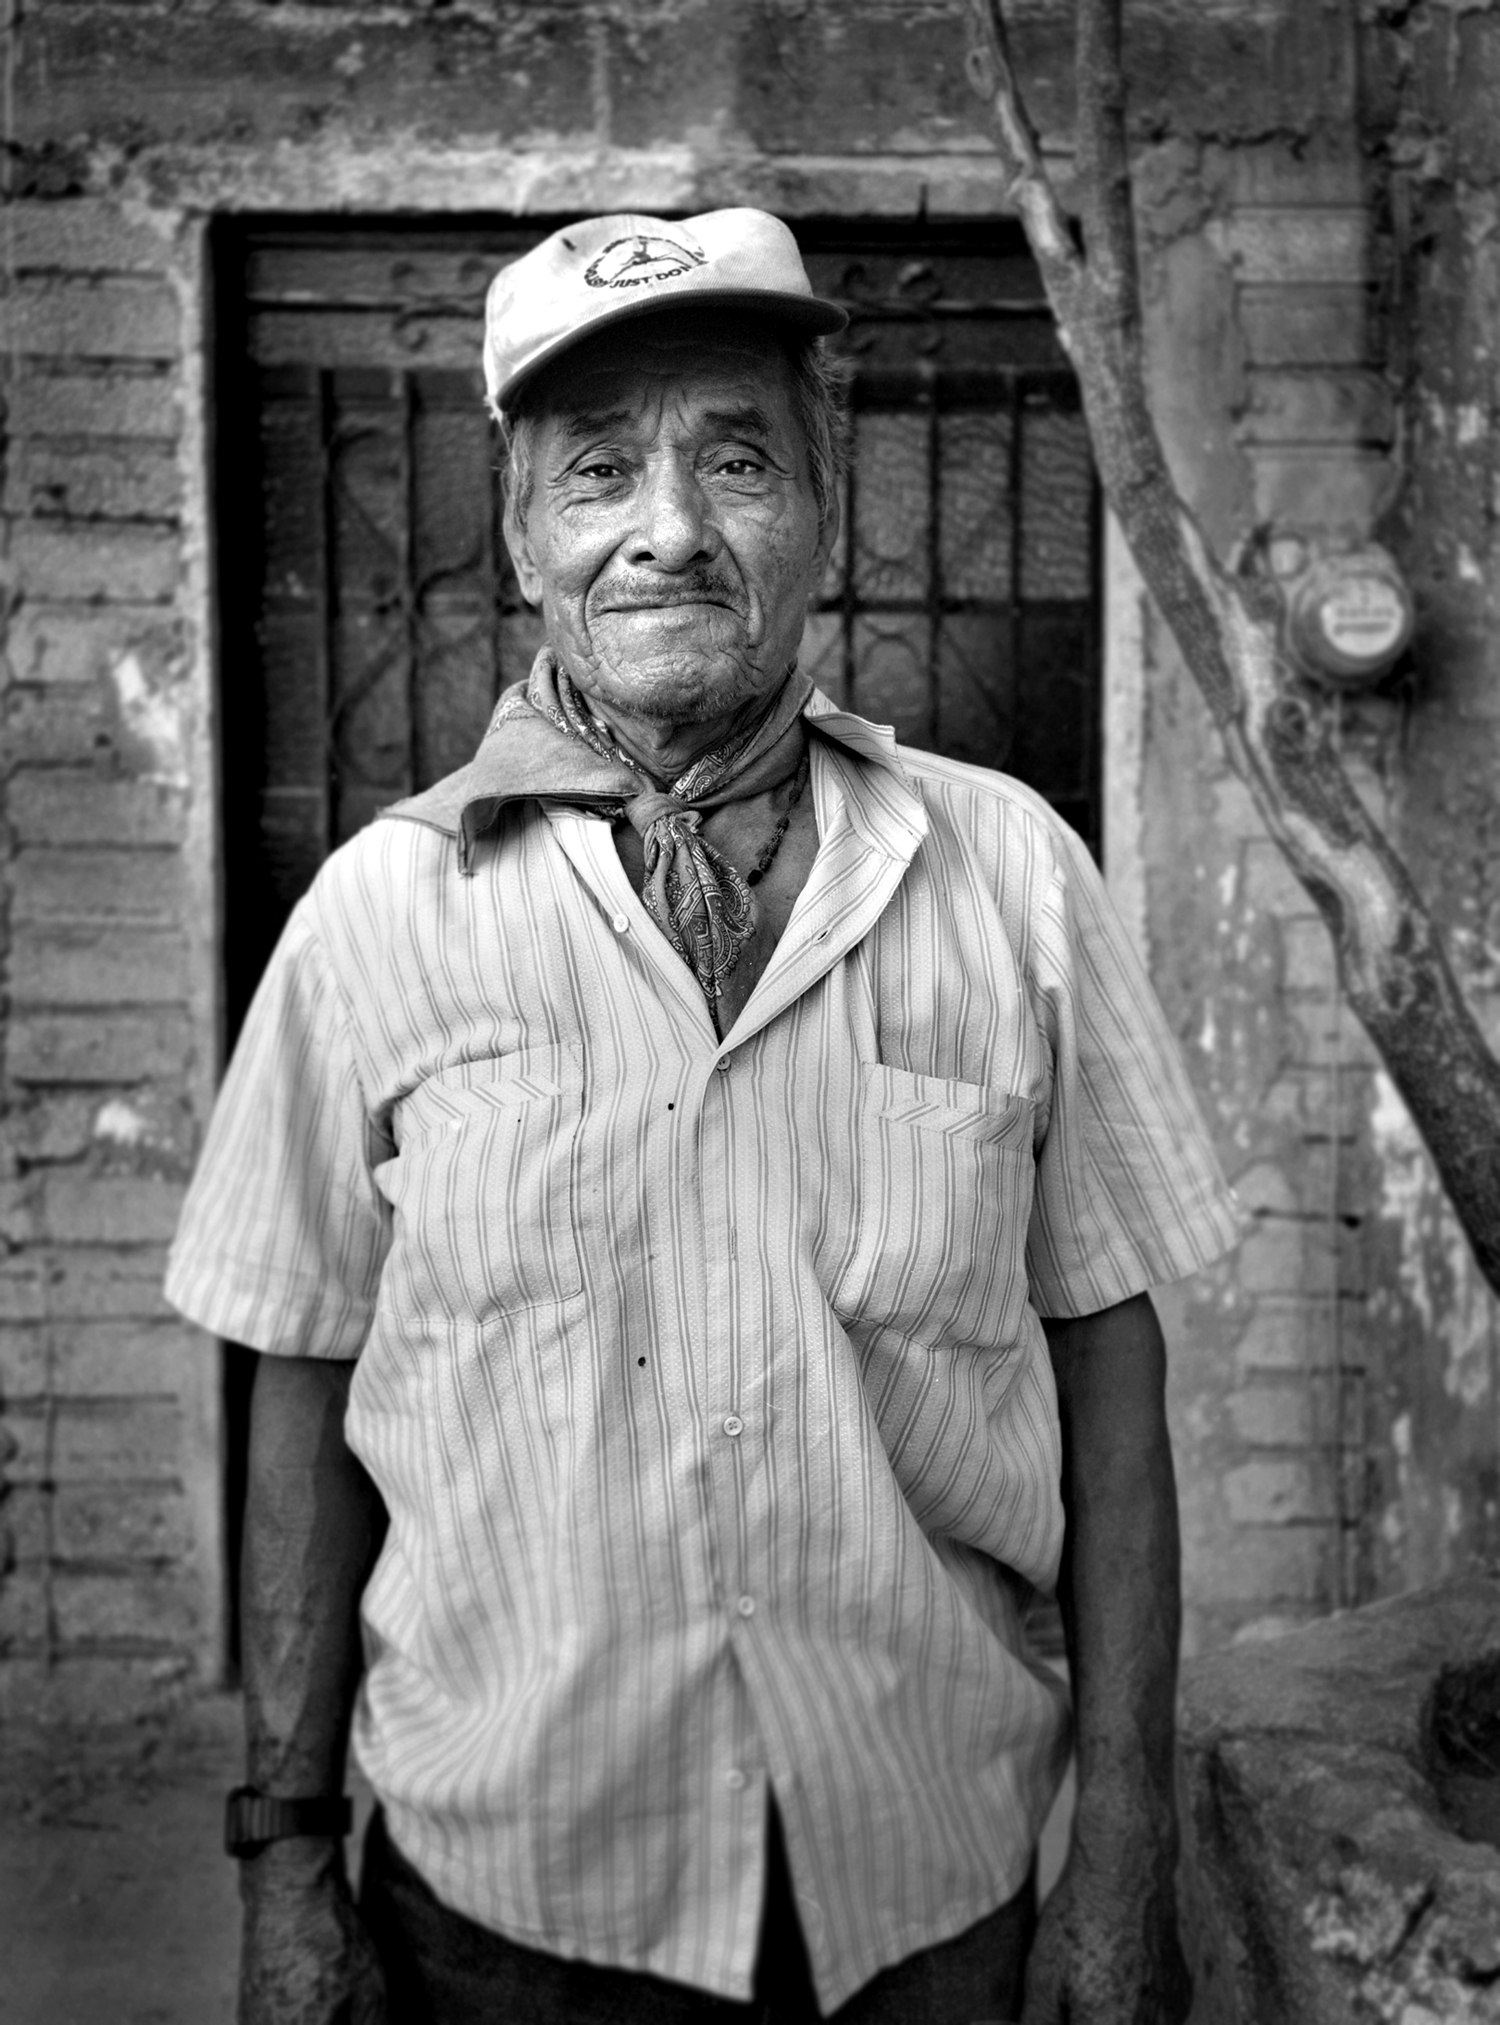 Street portrait, Guatemala